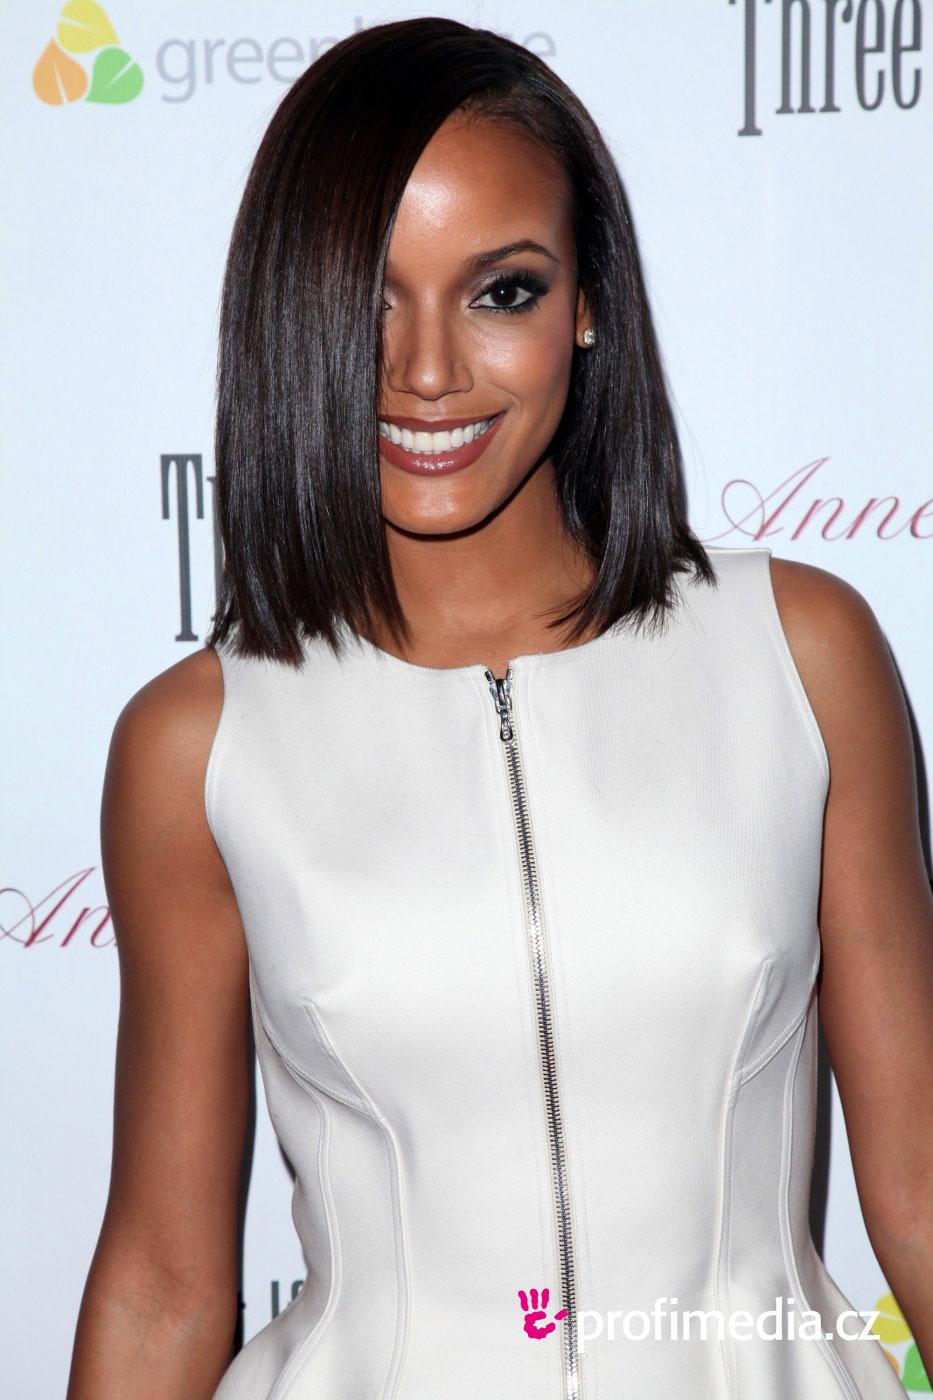 Selita Ebanks Hairstyle Easyhairstyler